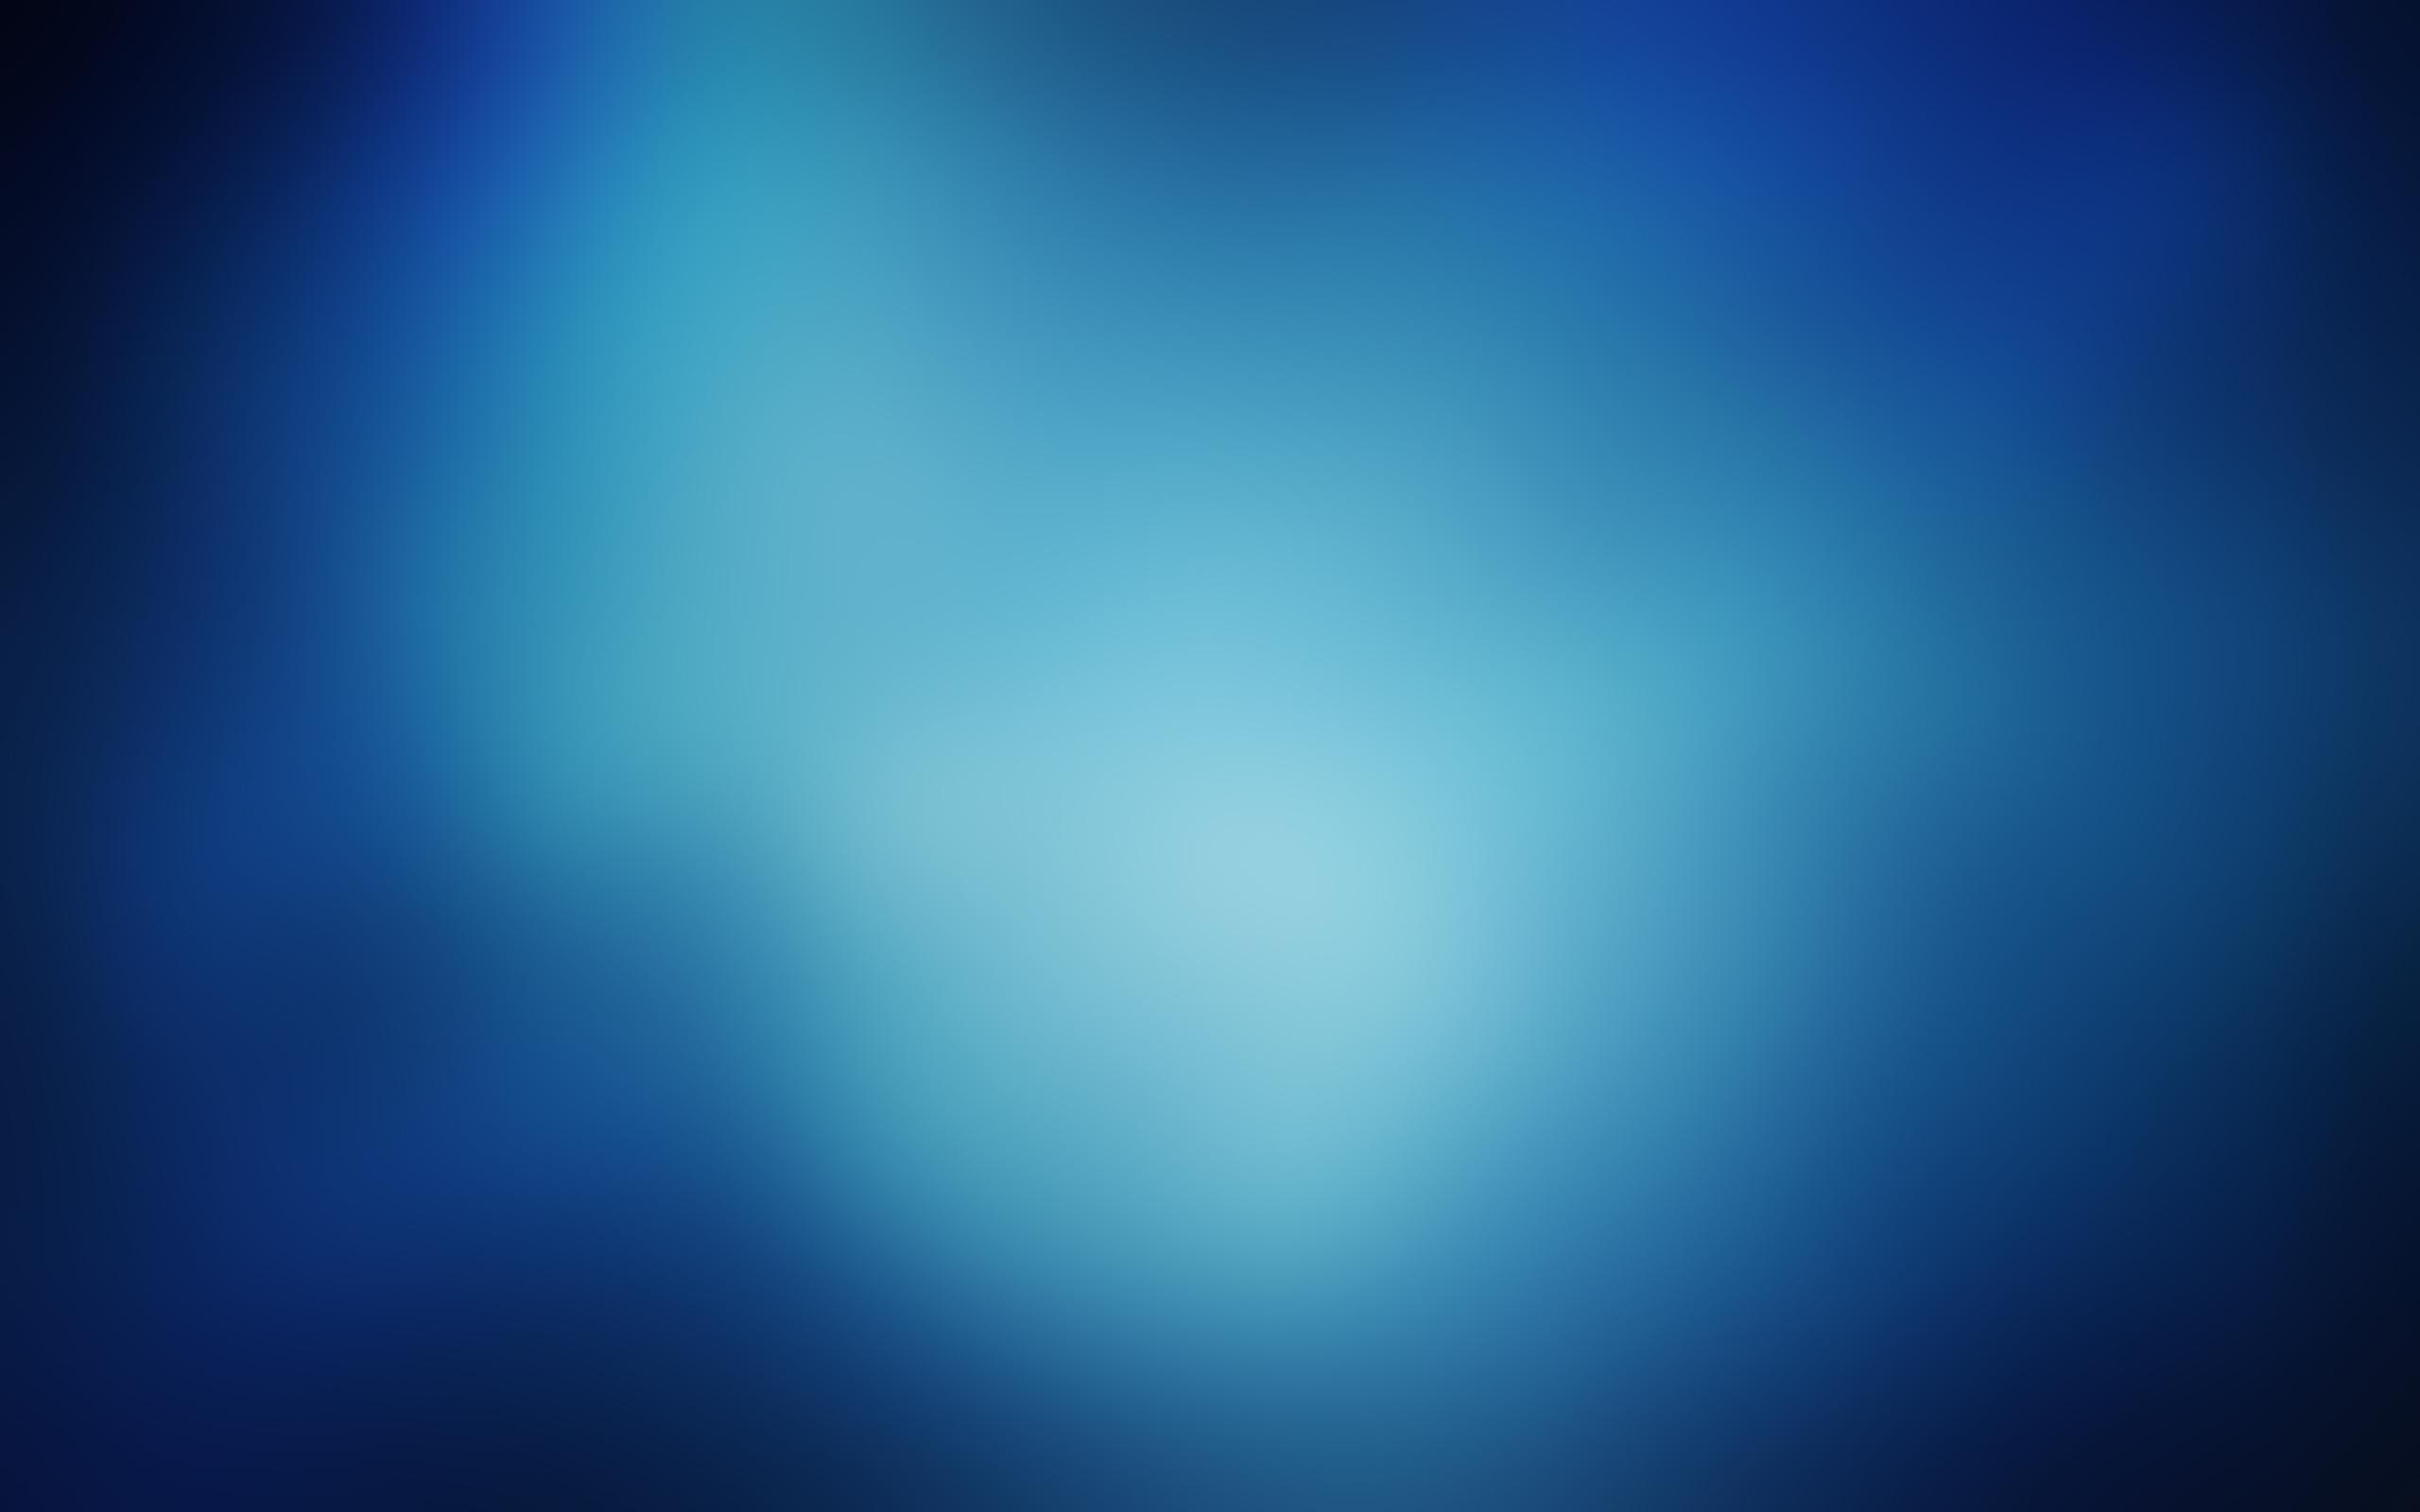 Sfondi Blu Hd 83 Immagini